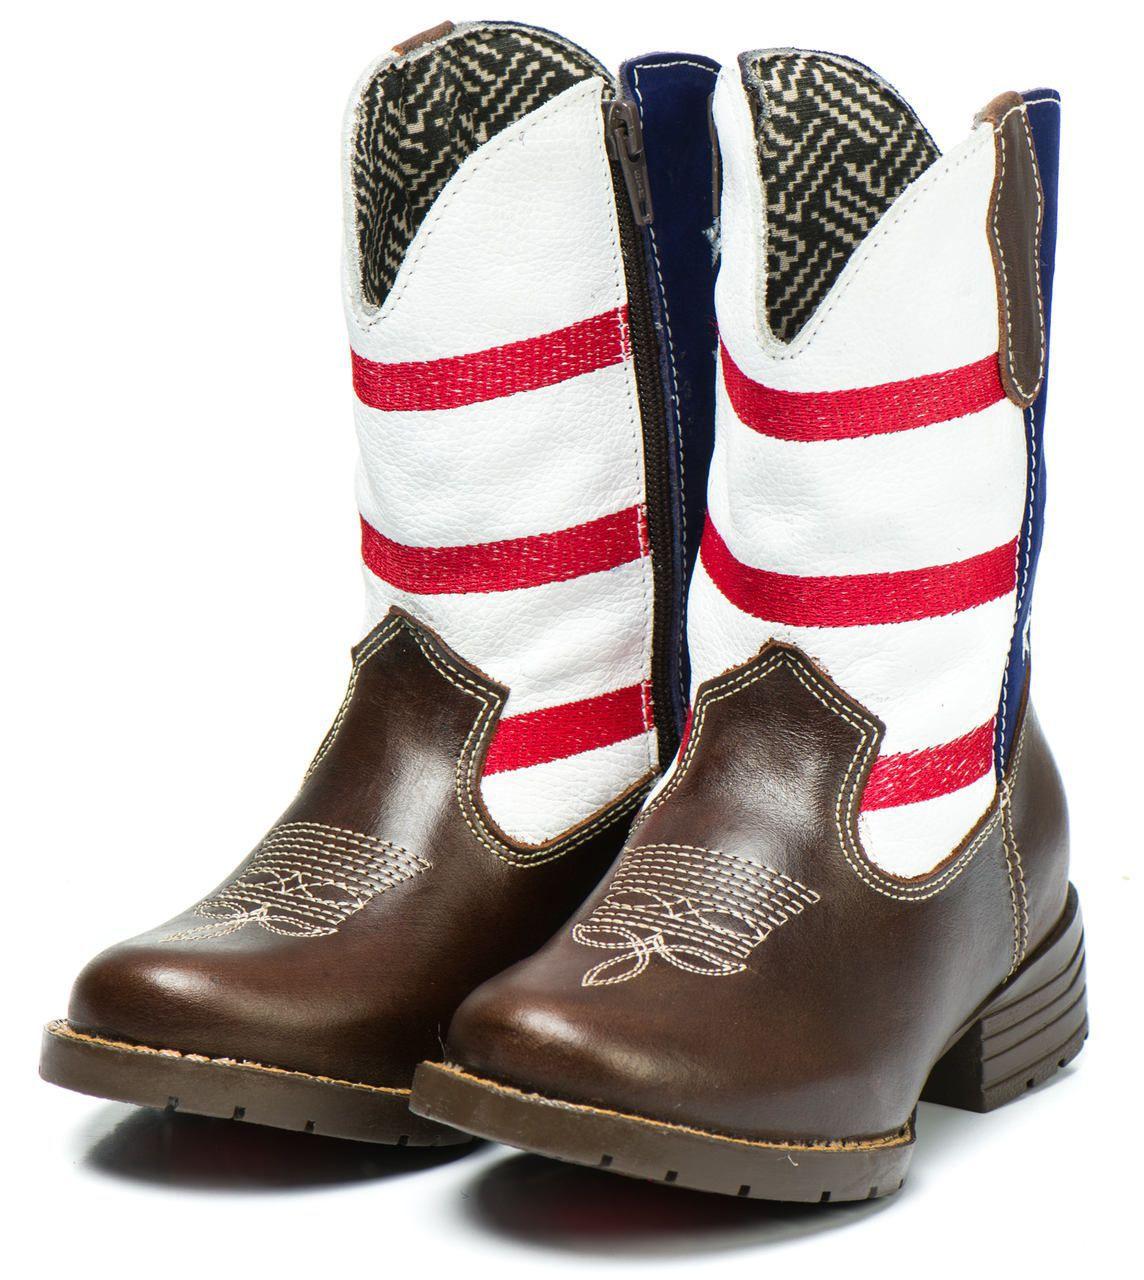 5dec9b1af Bota Country Texana Infantil Usa Masculina Menino Couro - Kapell ...